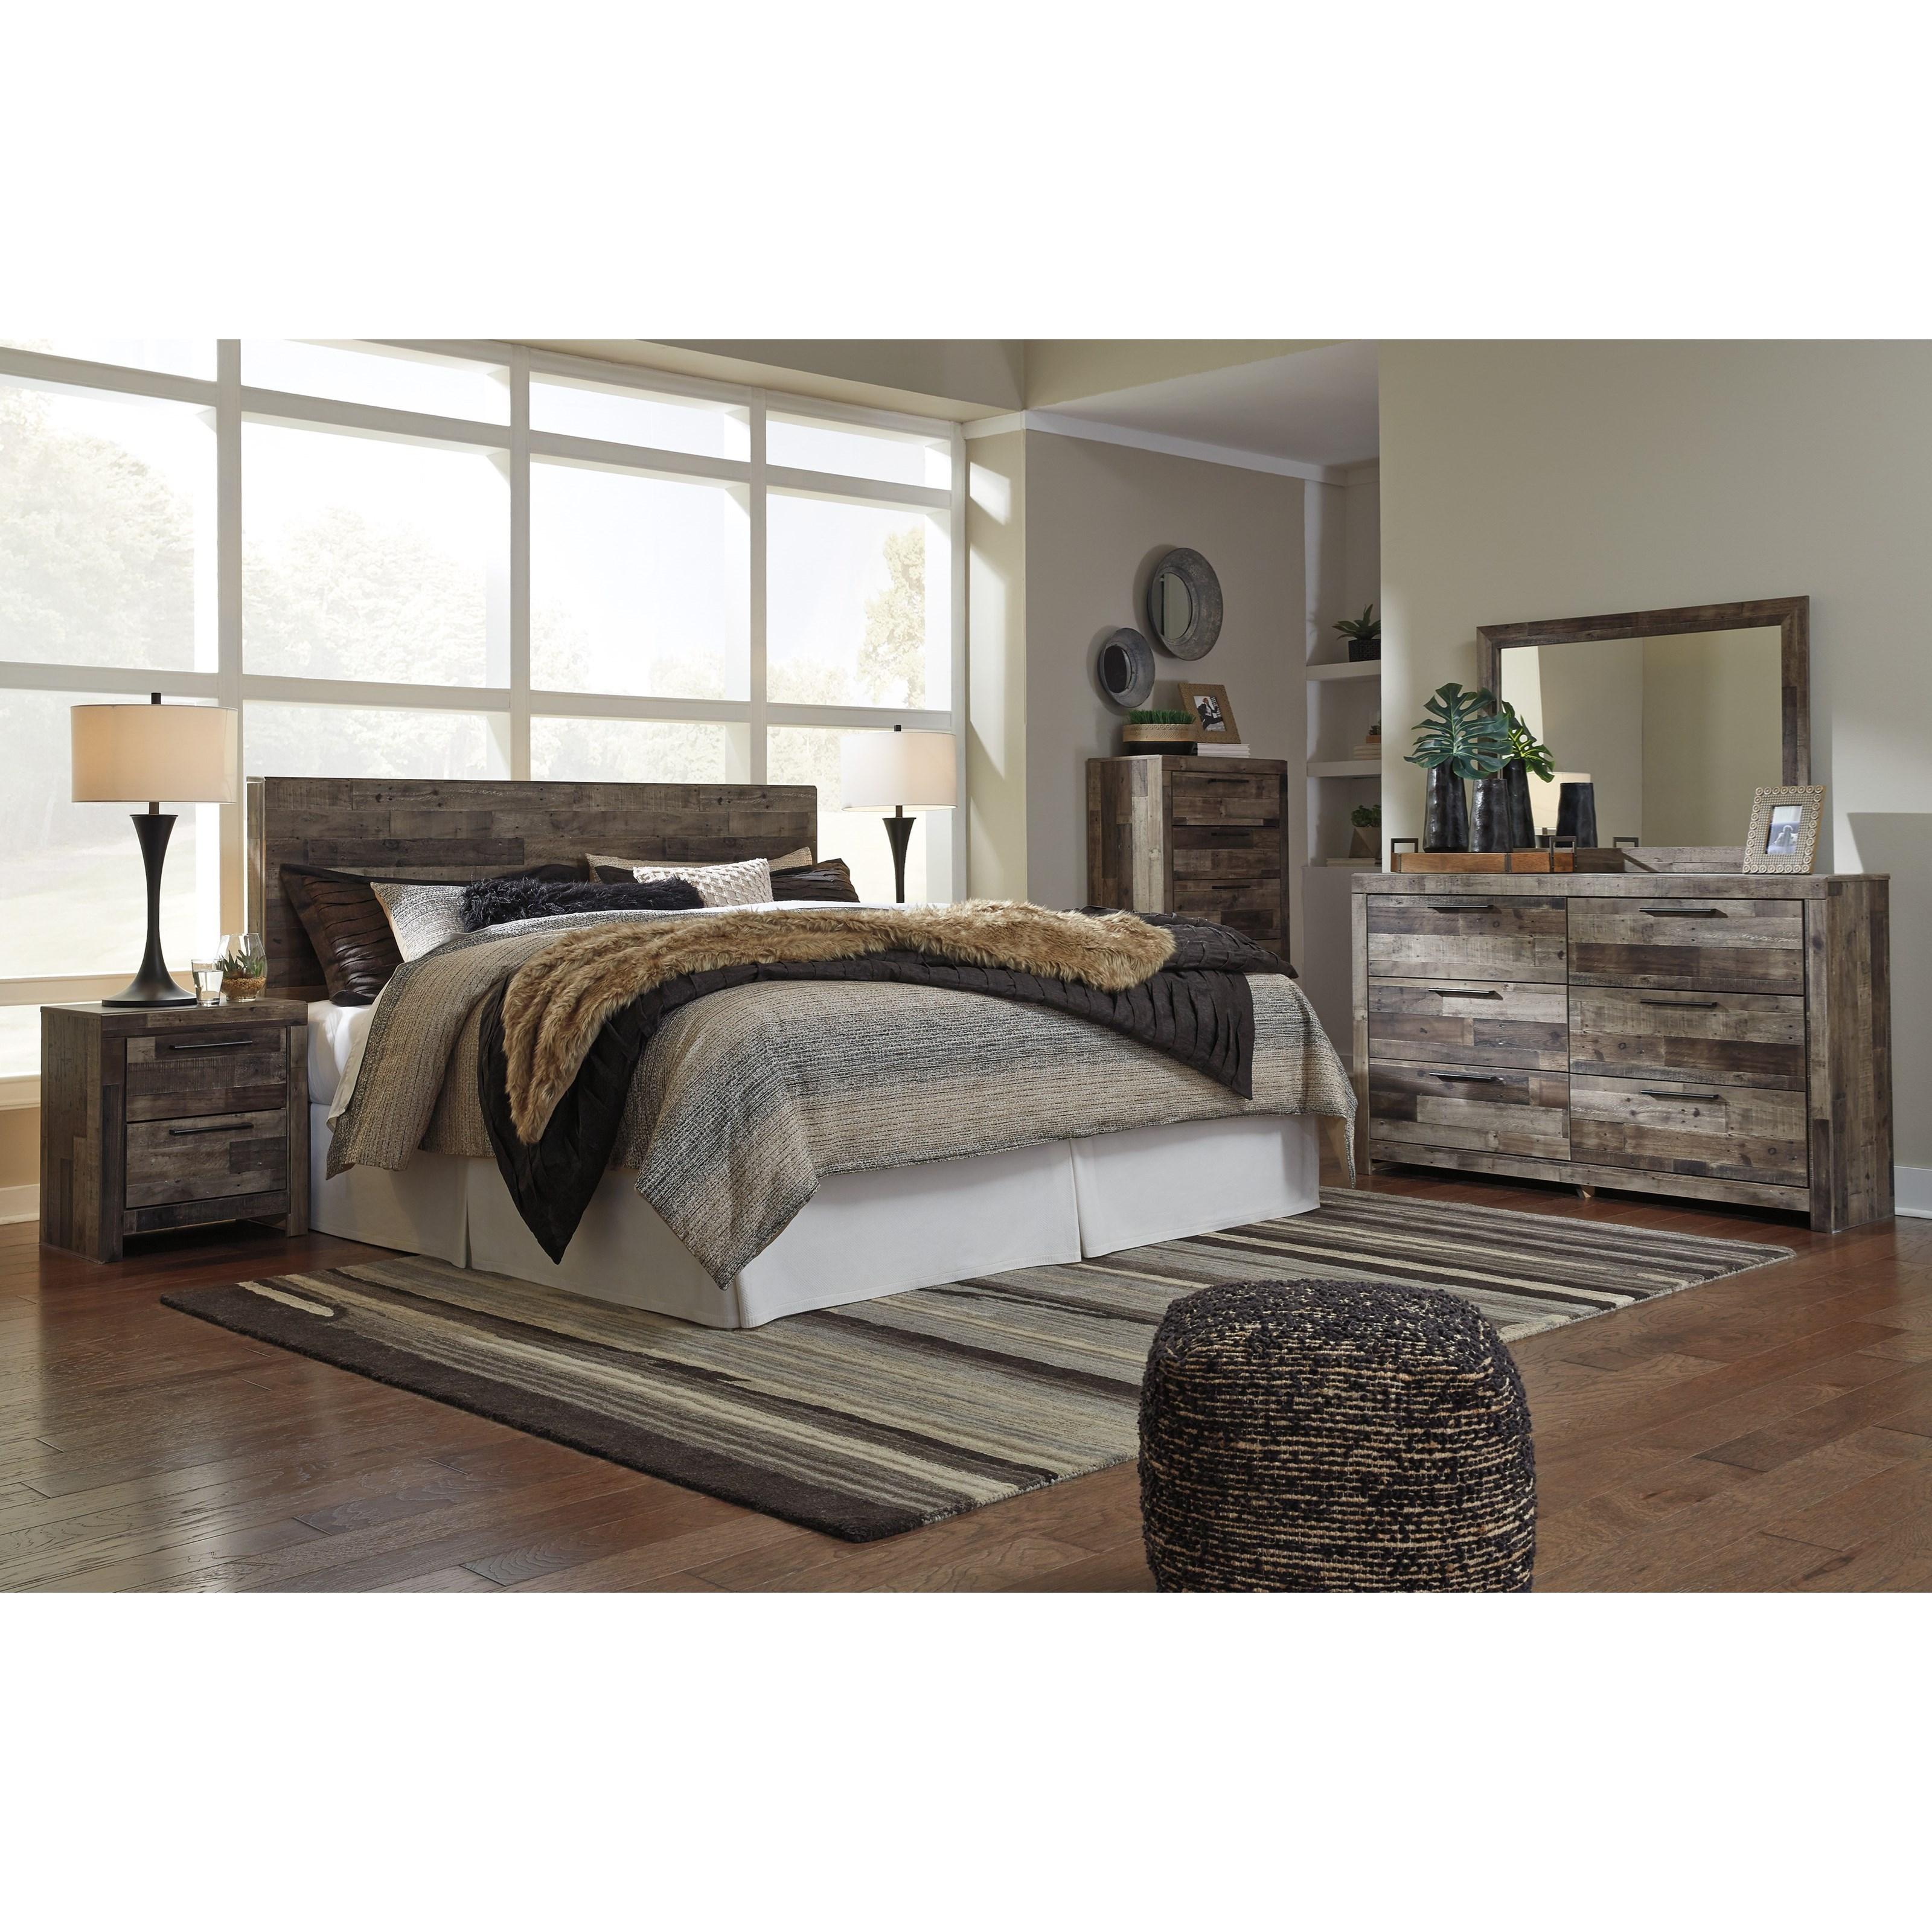 Derekson King Bedroom Group by Benchcraft at Darvin Furniture